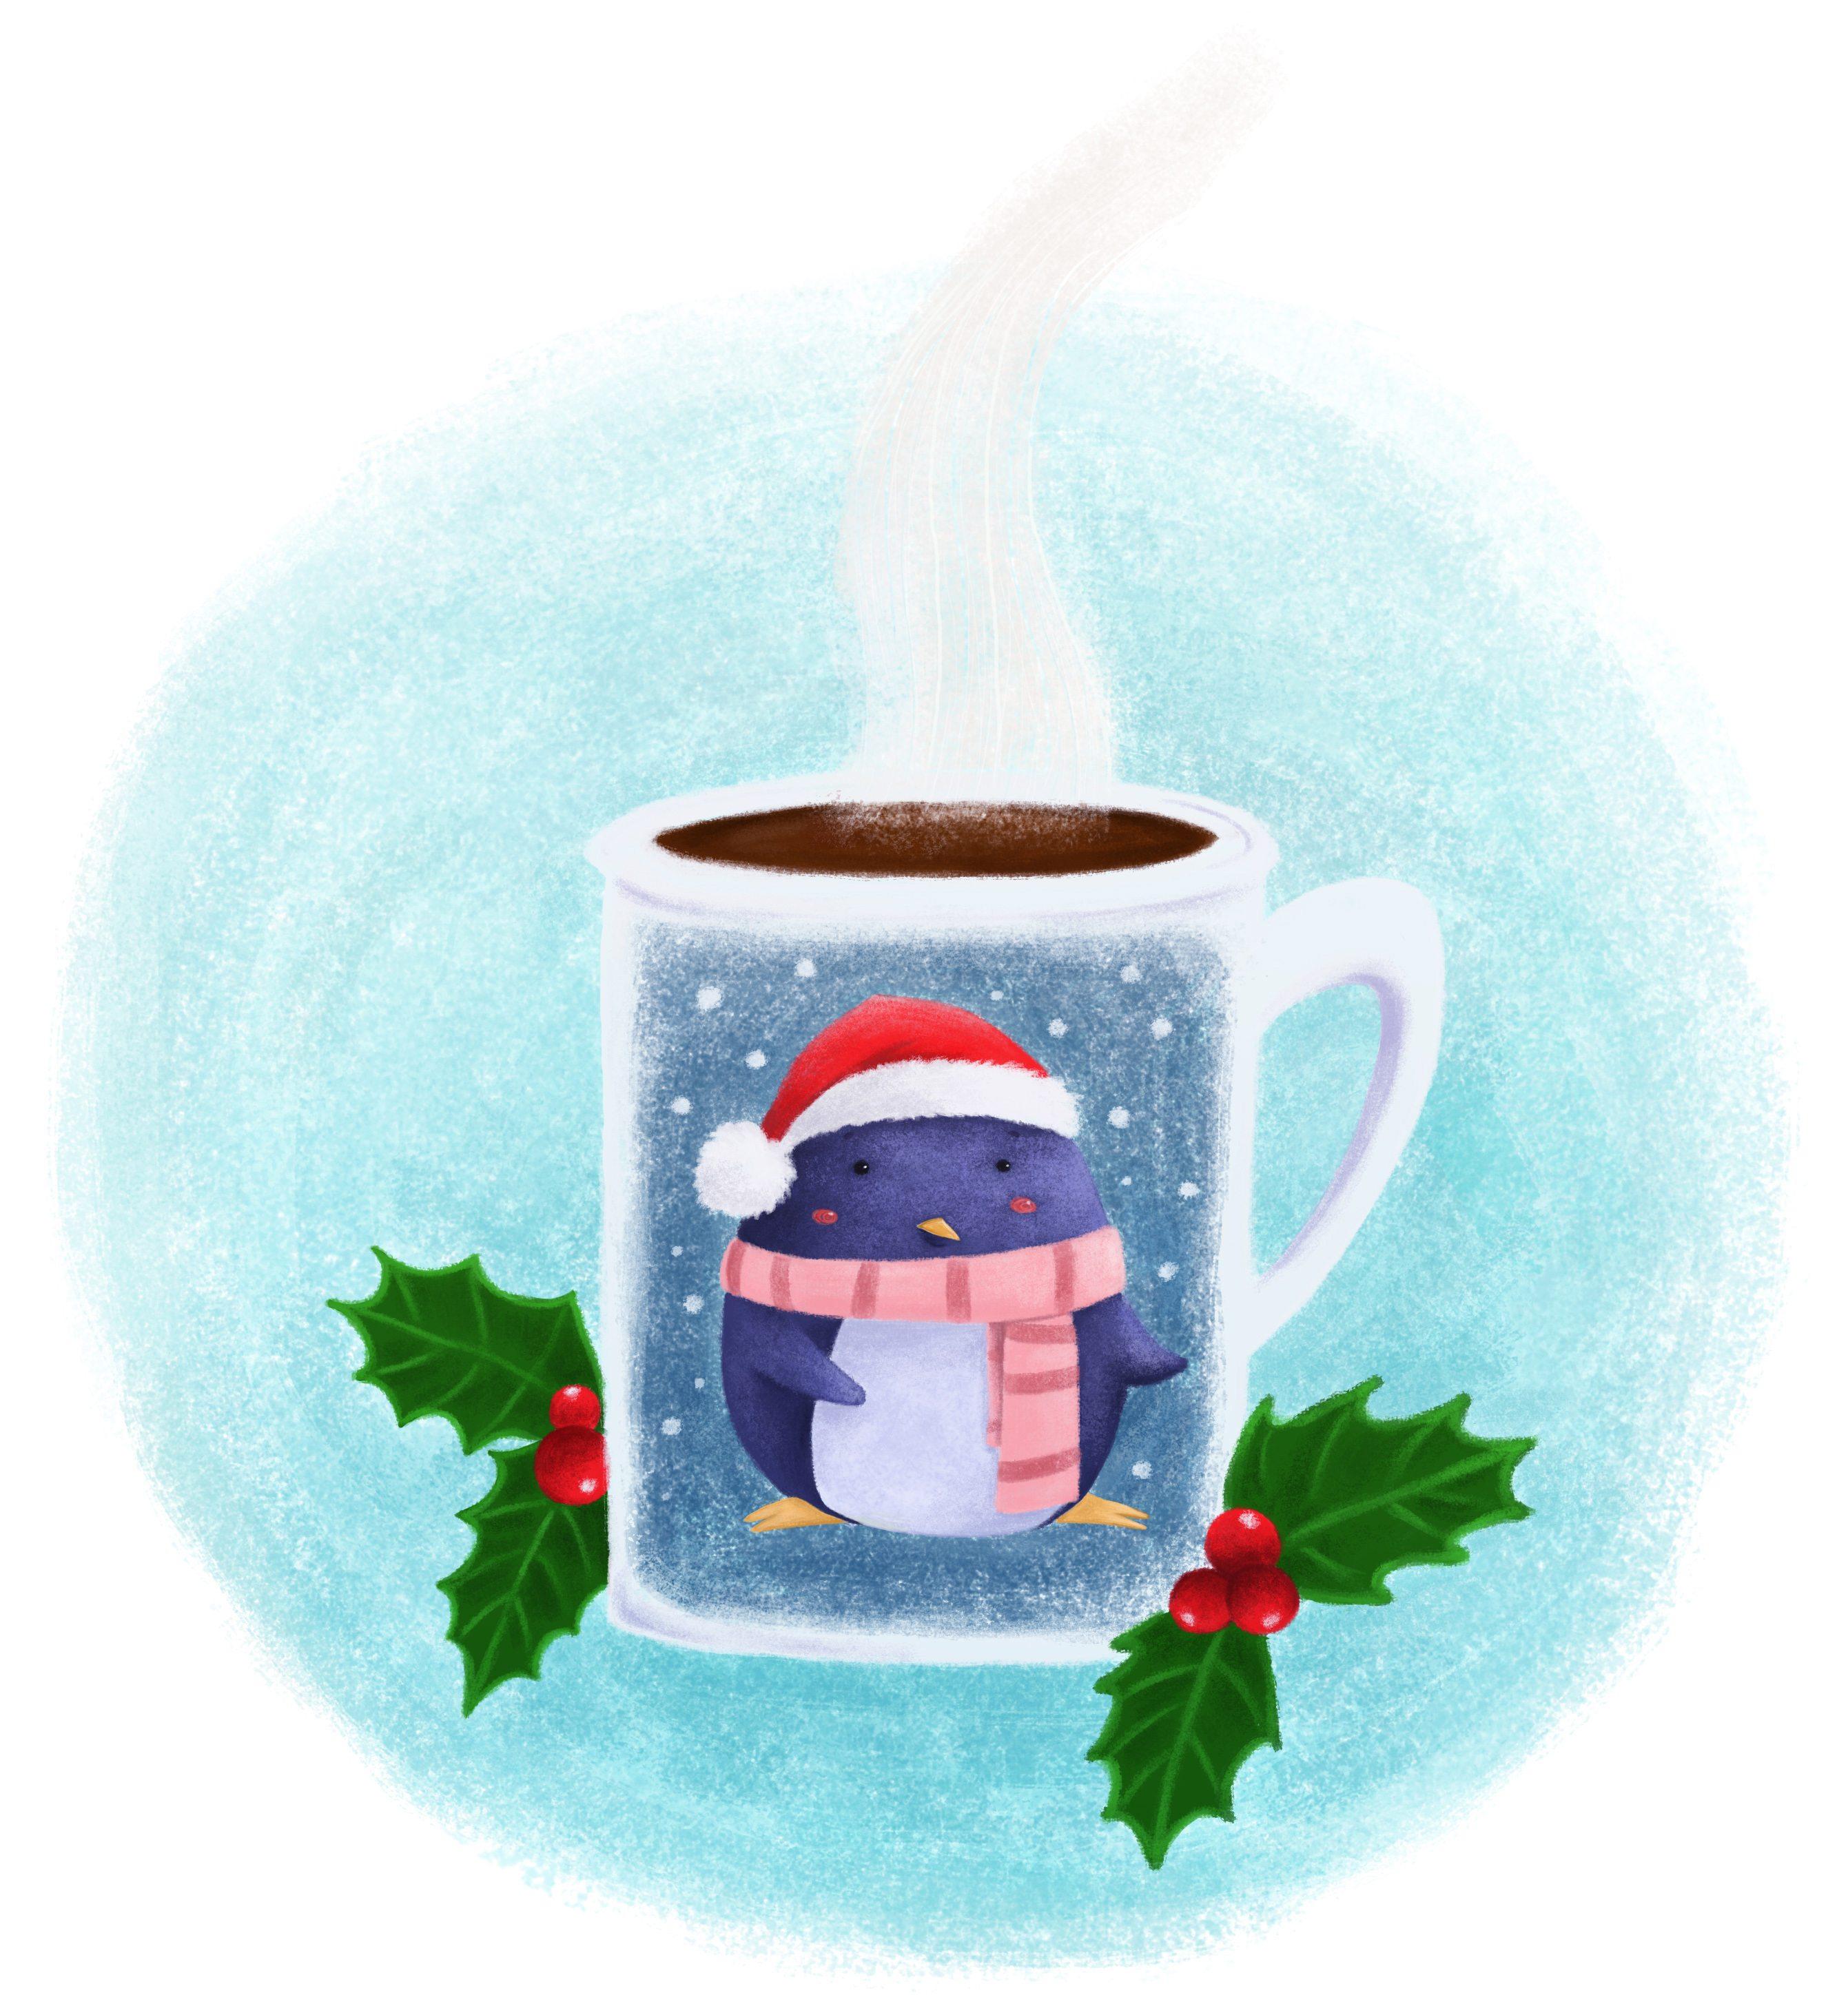 Christmas Mug Digital Illustration by Orgueil